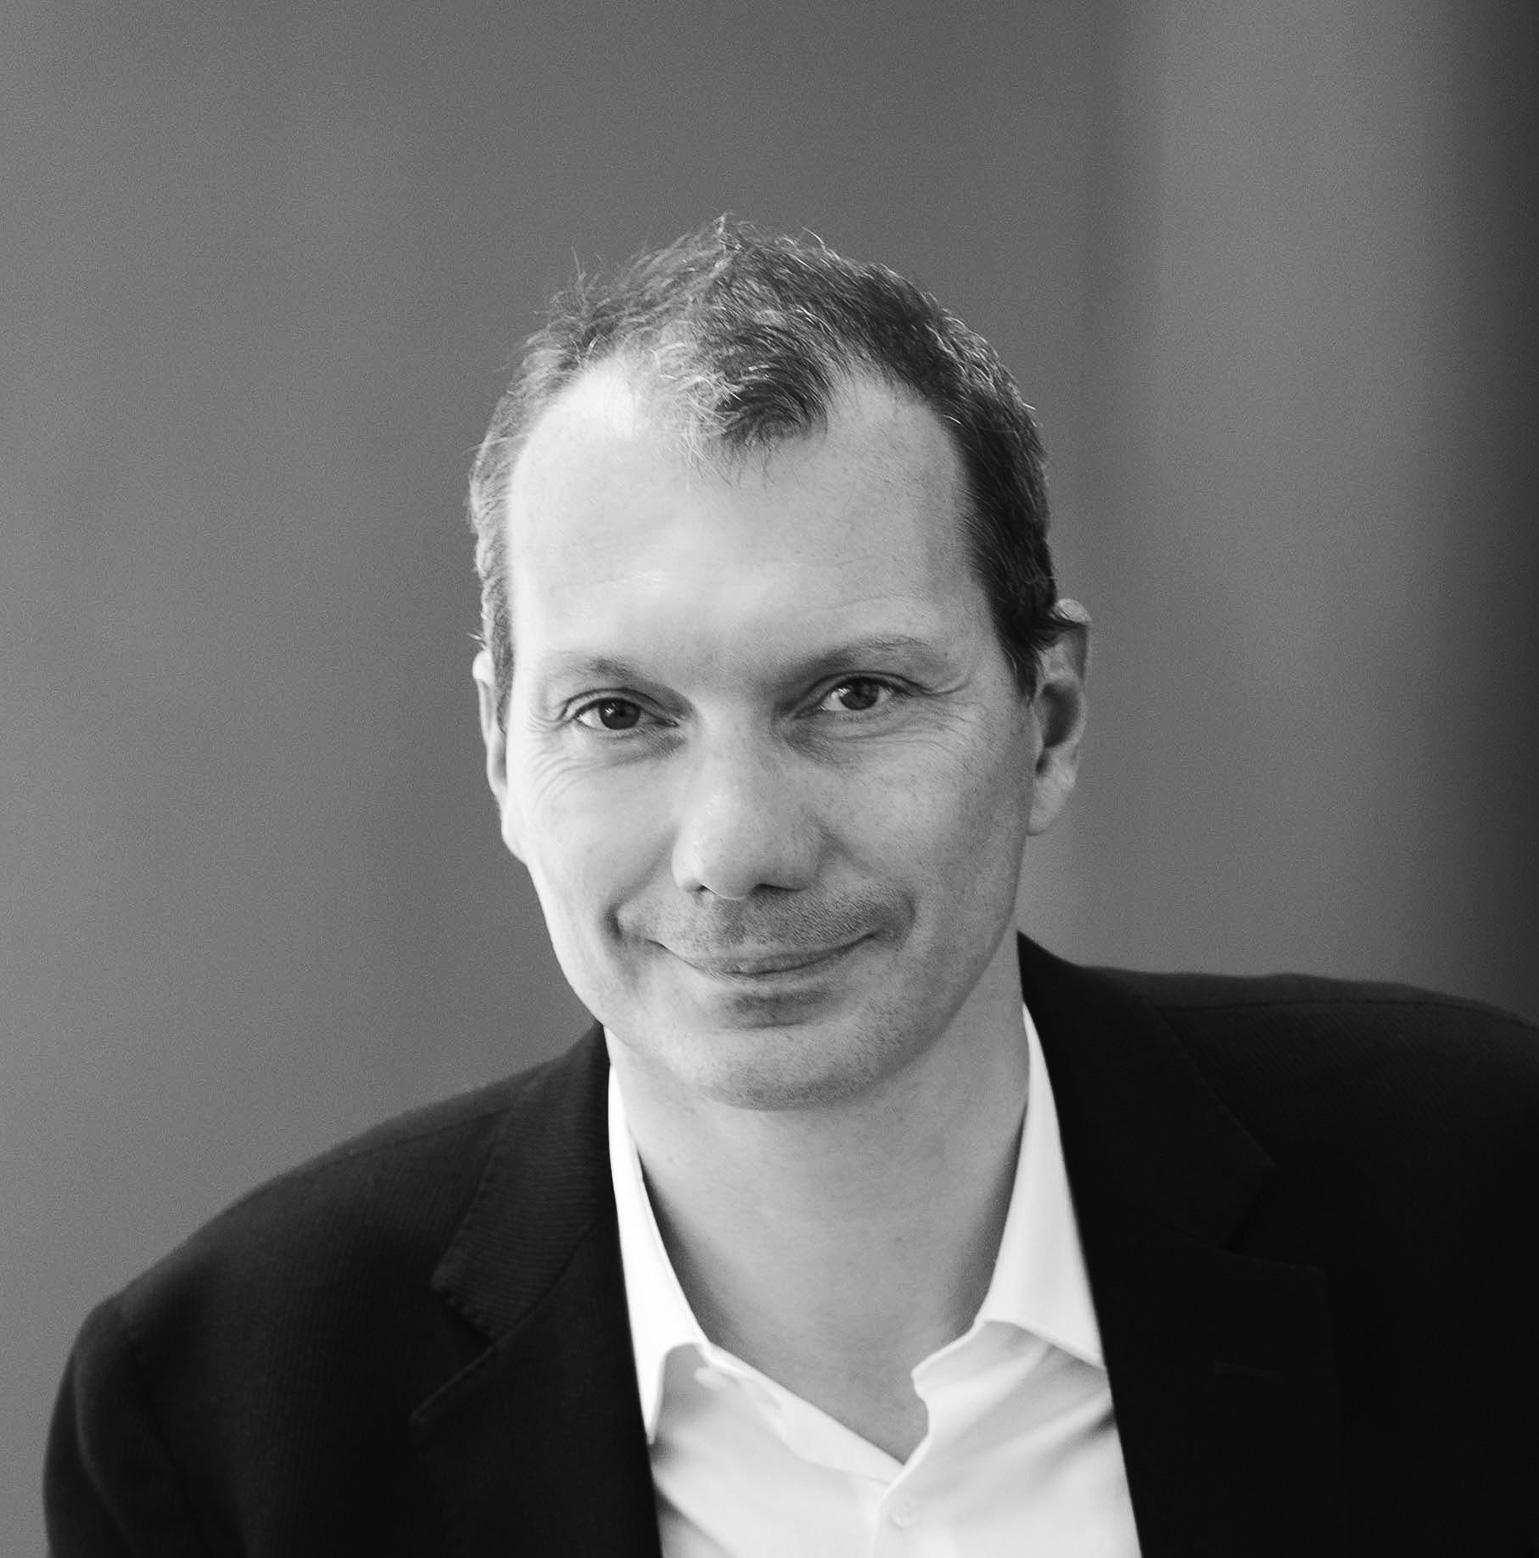 Portrait of David Cormand